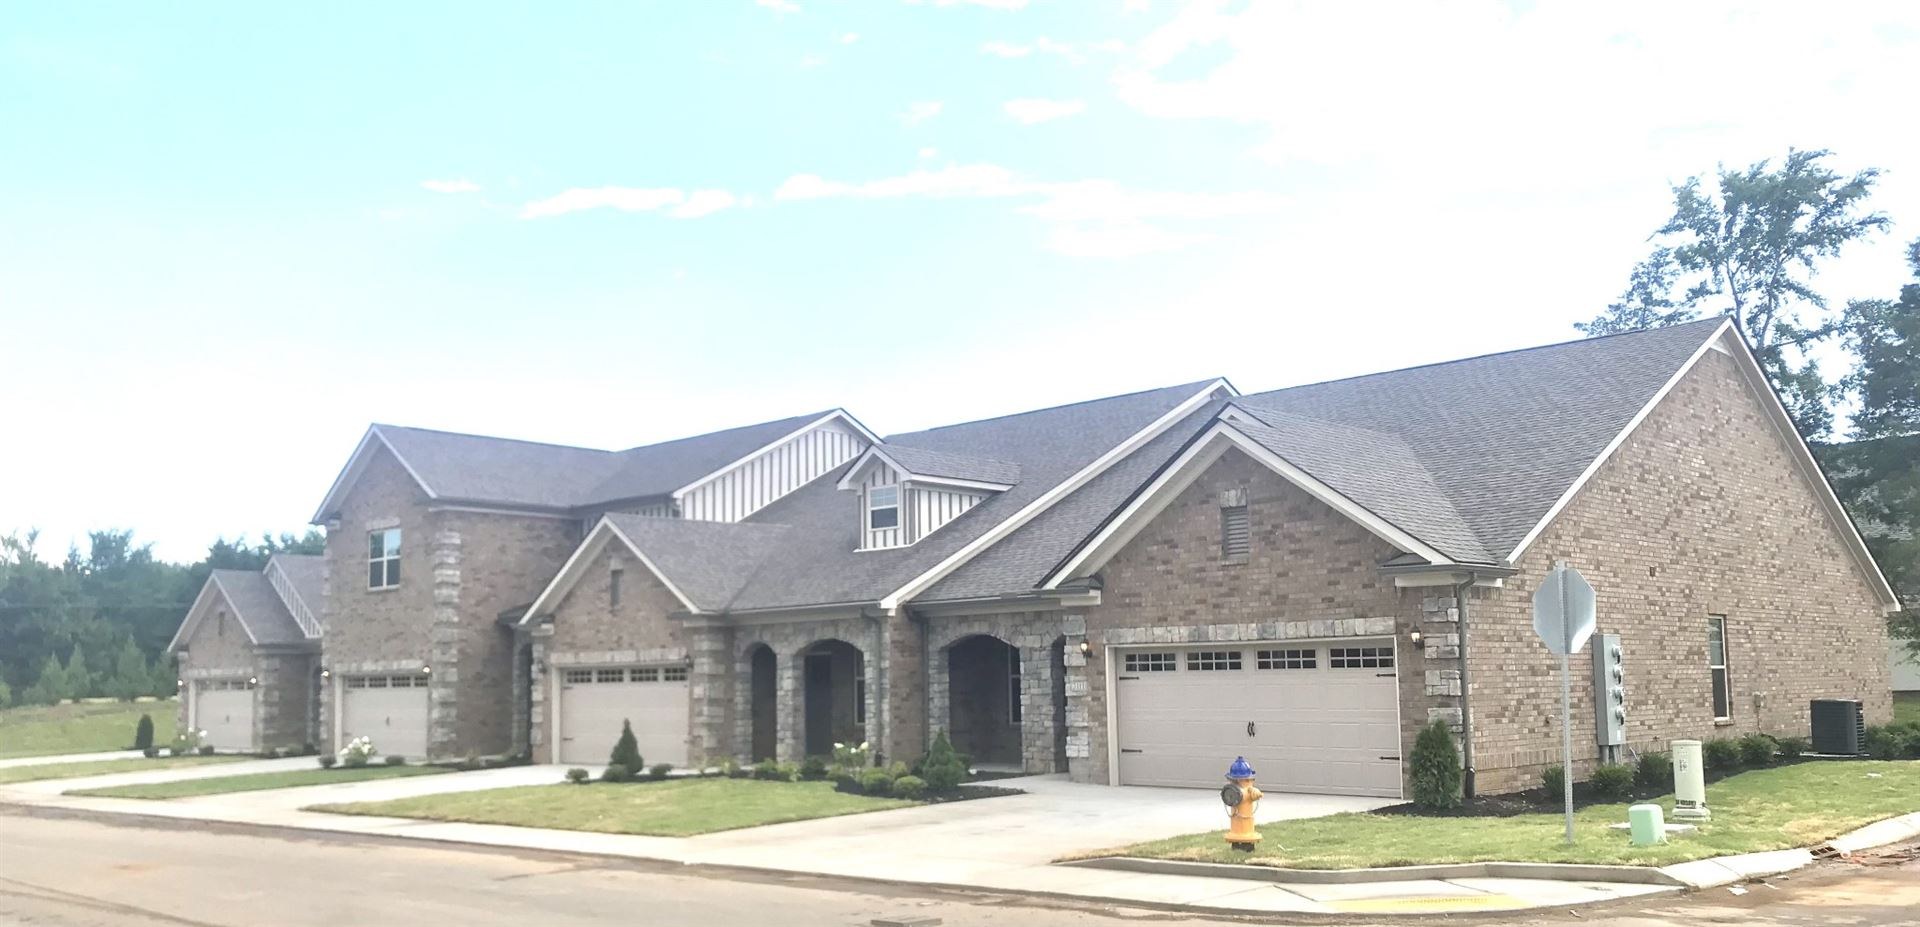 1128 Javelin Lane (Lot 43), Murfreesboro, TN 37130 - MLS#: 2248729